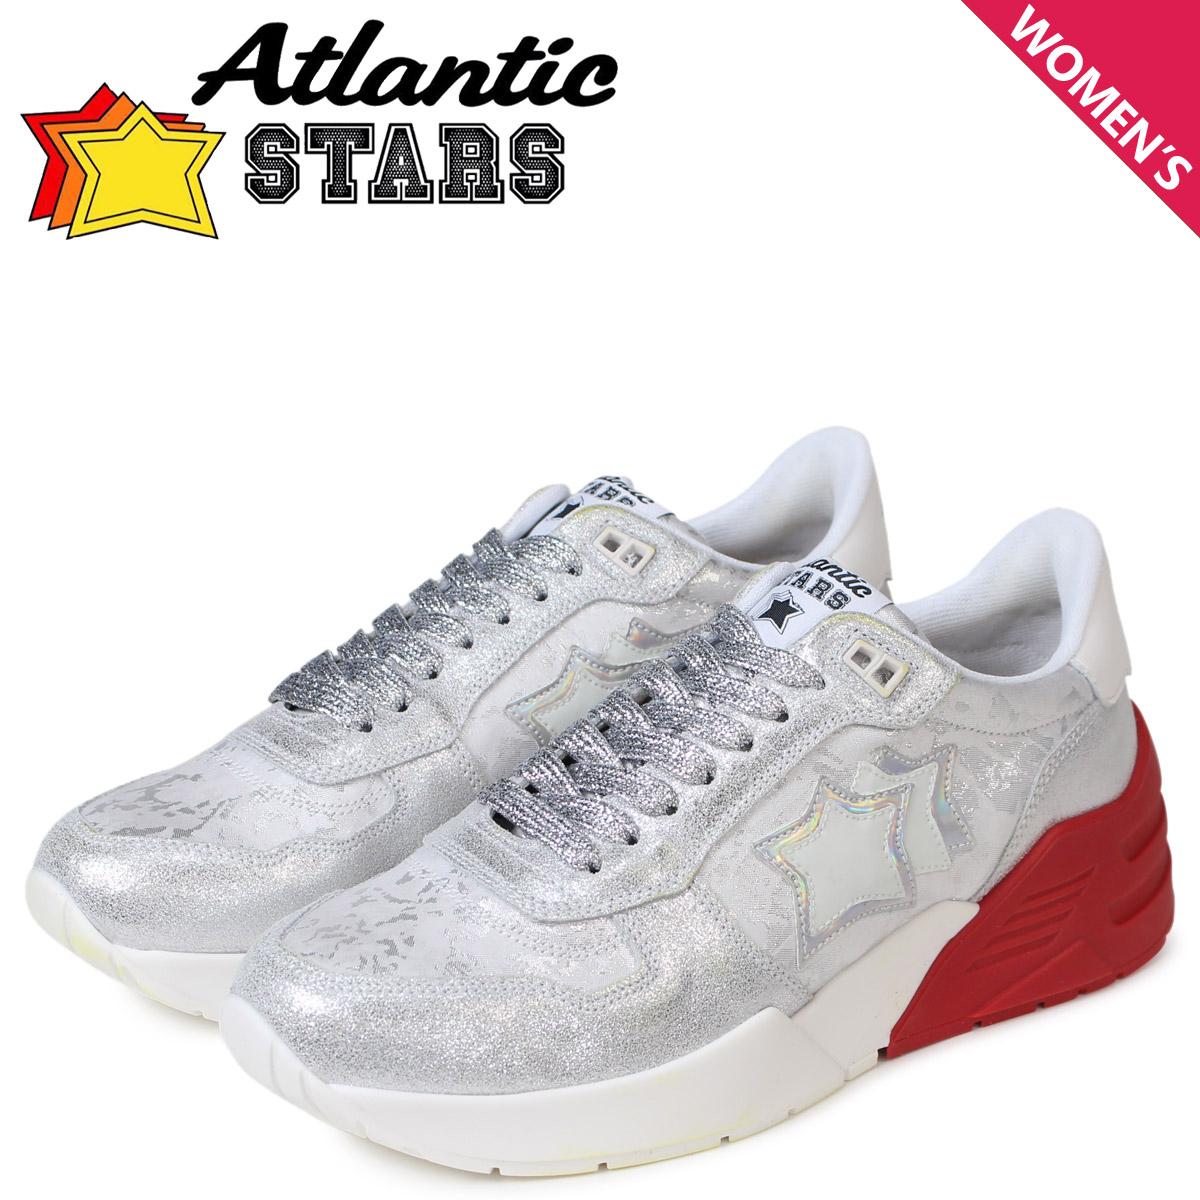 Atlantic STARS レディース スニーカー アトランティックスターズ ビーナス VENUS AC-SN01 シルバー